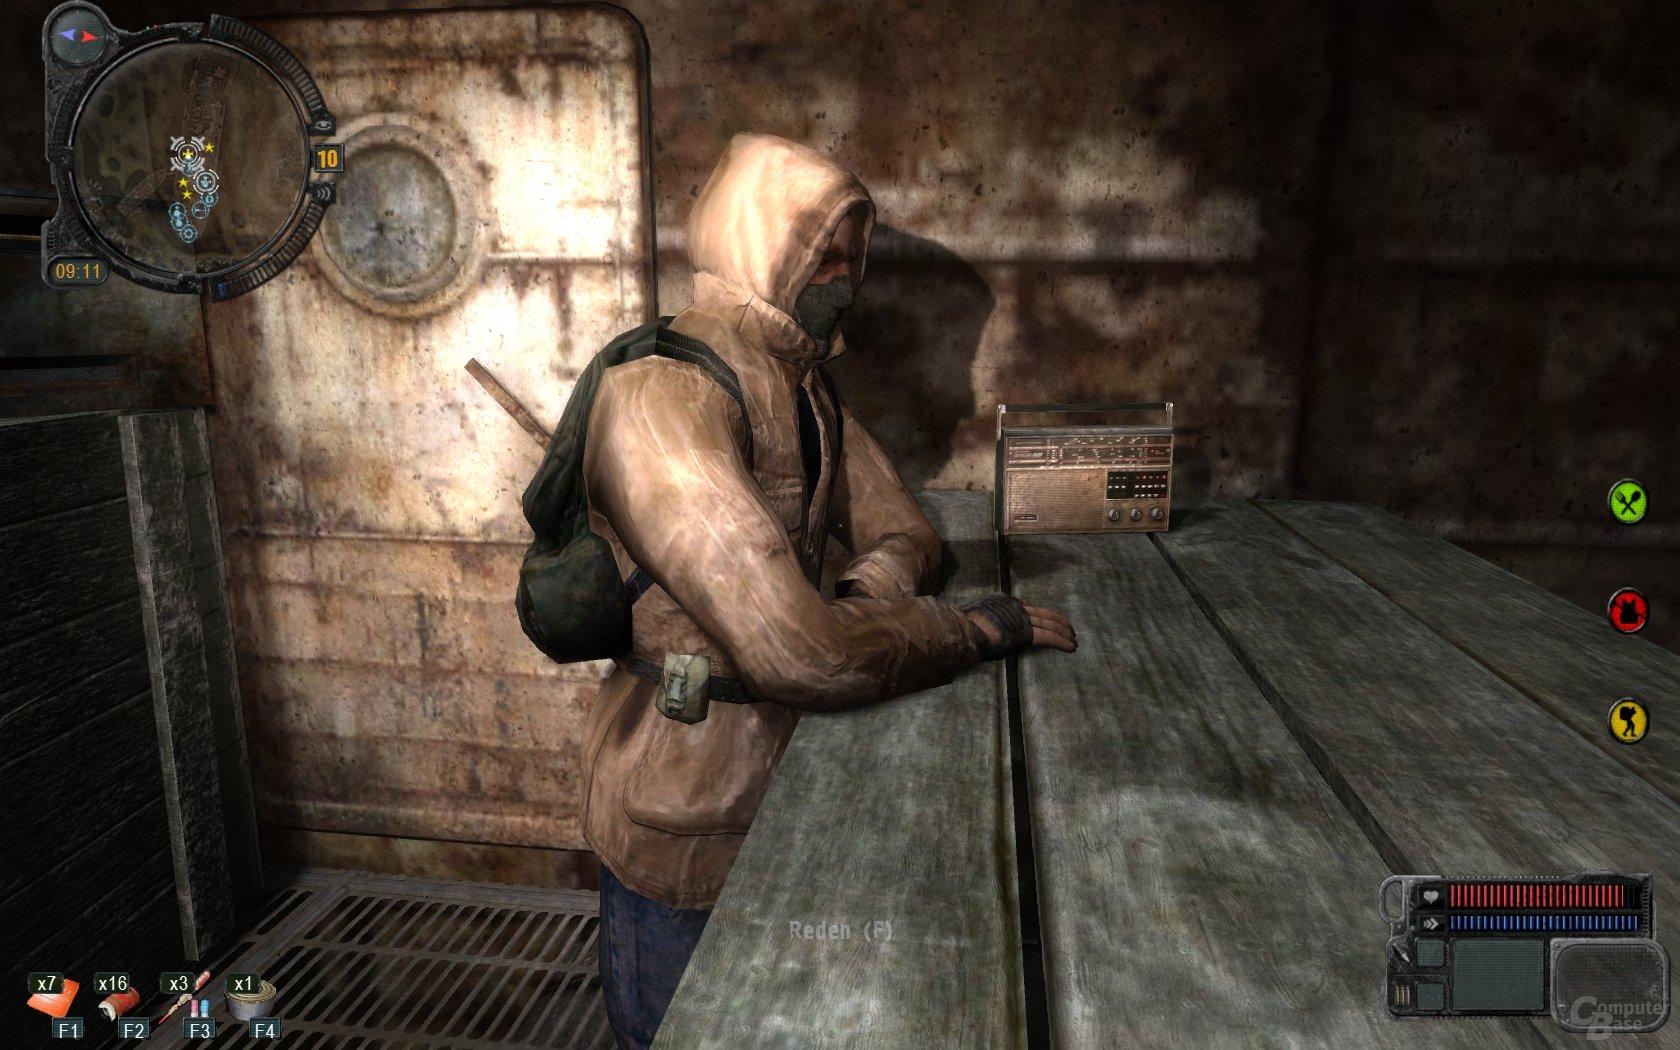 S.T.A.L.K.E.R. - Call of Pripyat